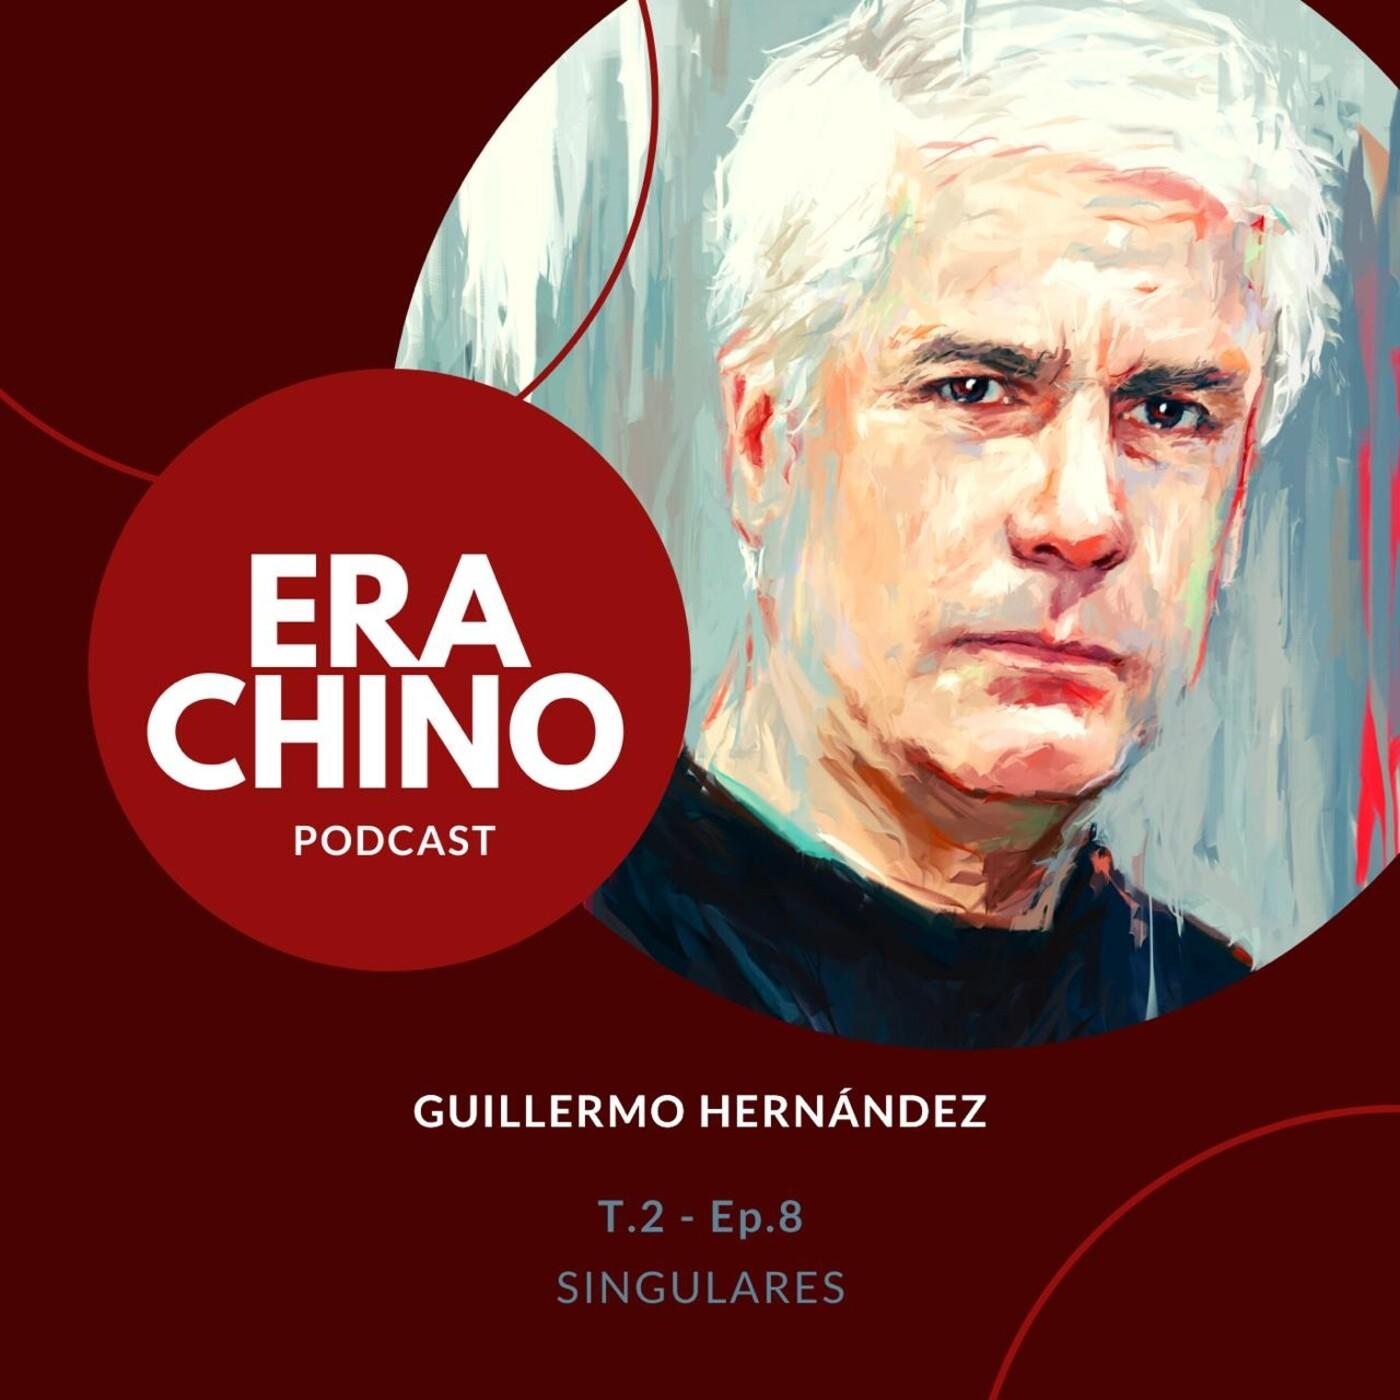 Era Chino T02E08 : Singulares.